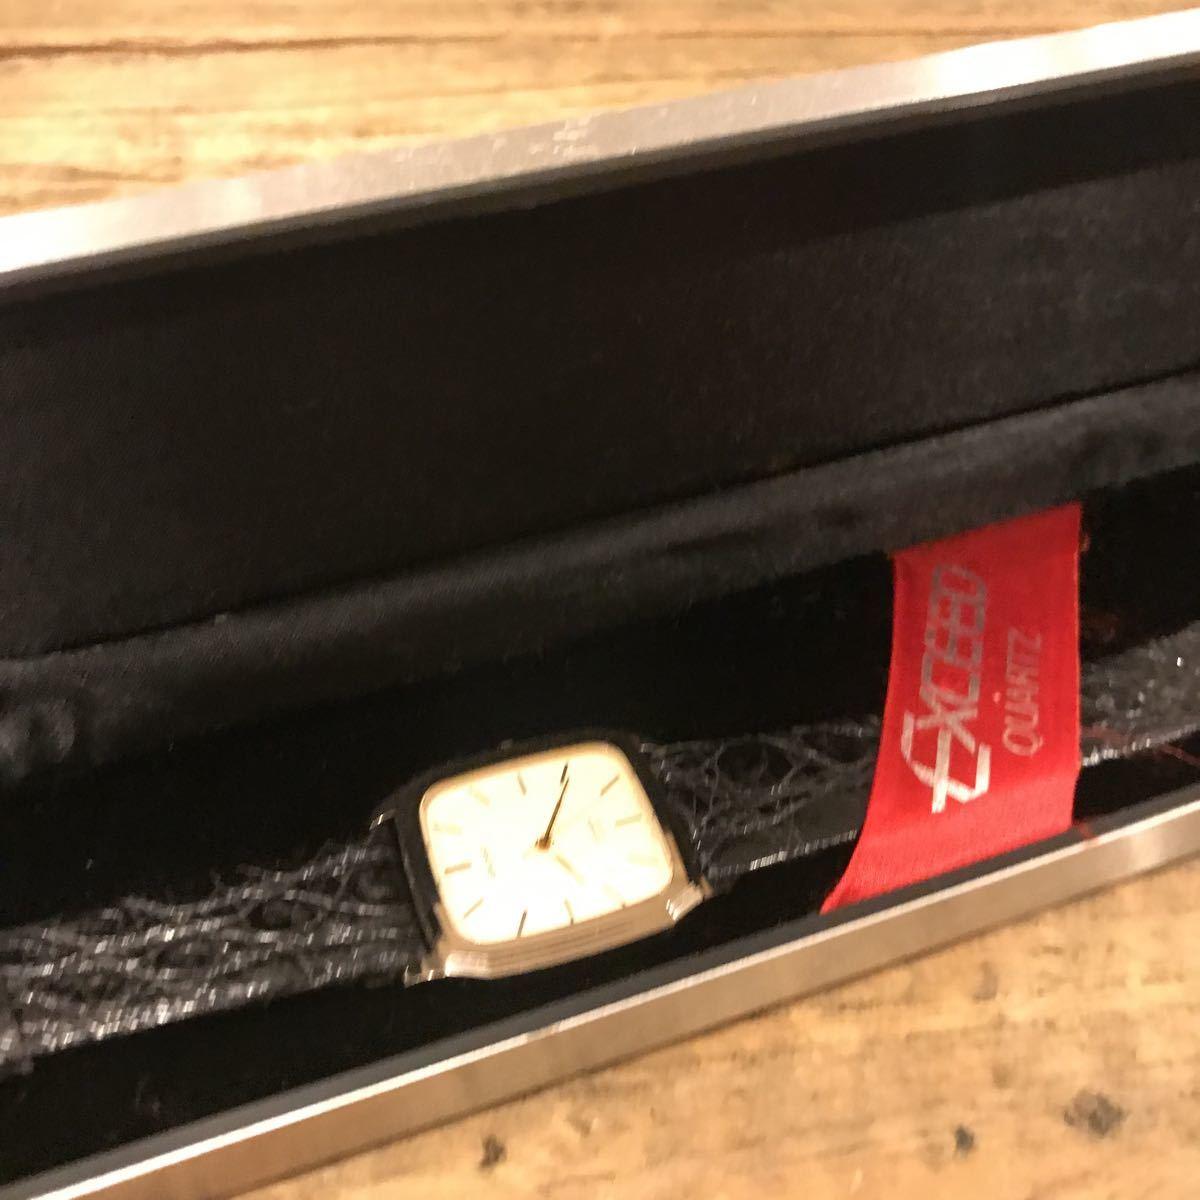 7018☆ CITIZEN シチズン EXCEED エクシード メンズ 腕時計  現状品 ケース付き 動作未確認 ベルトブラック 記念  ☆同梱不可☆_画像2